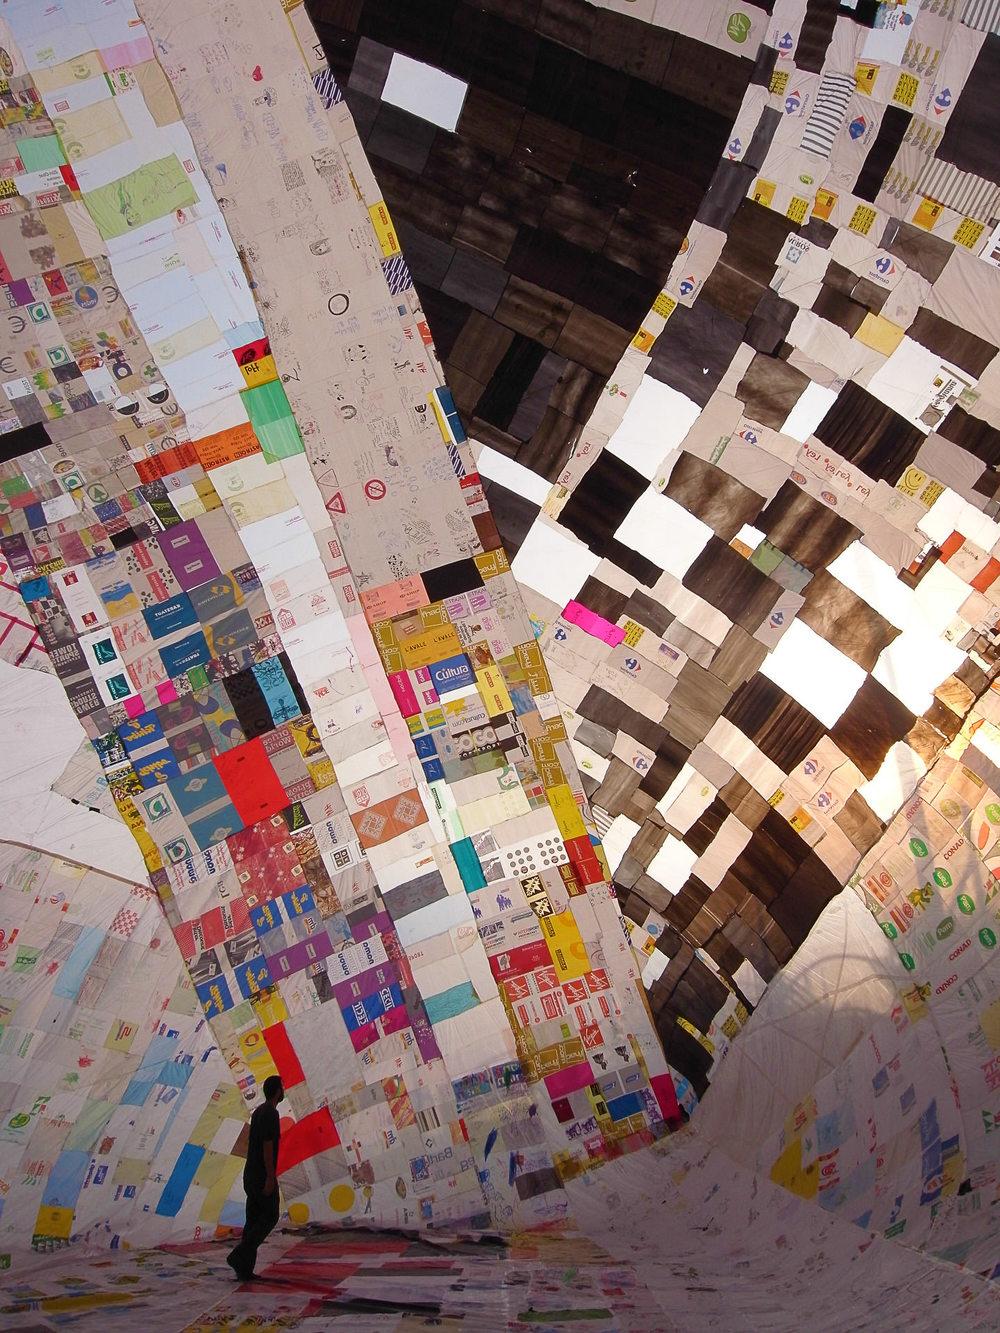 Museo Aero Solar in Ein Hawd, Israel, 2008. Photography by Studio Tomás Saraceno, © Museo Aero Solar, 2008